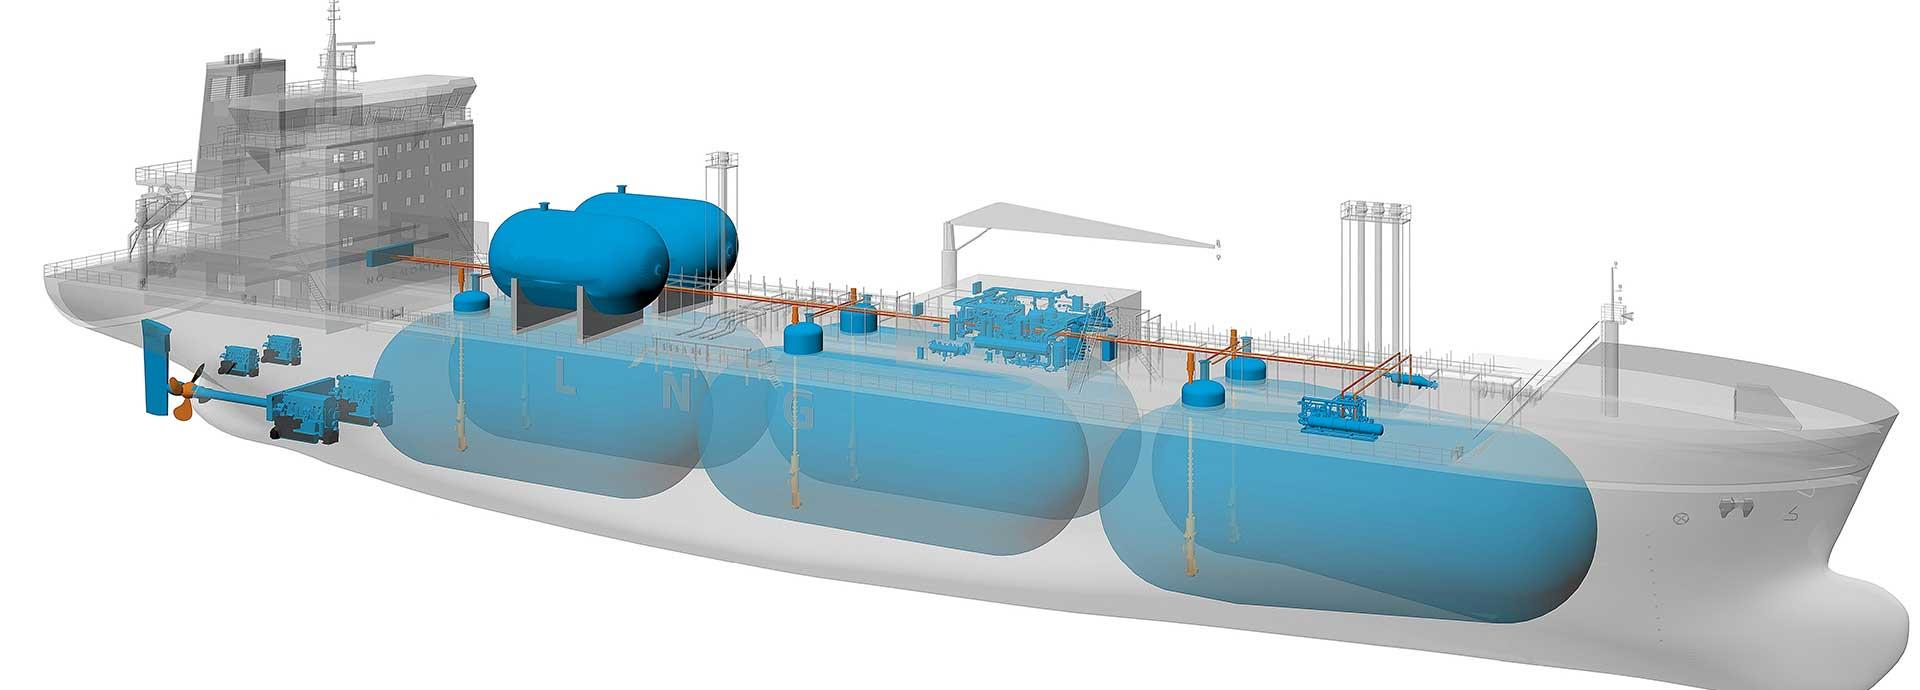 World's first ethane-powered marine vessels